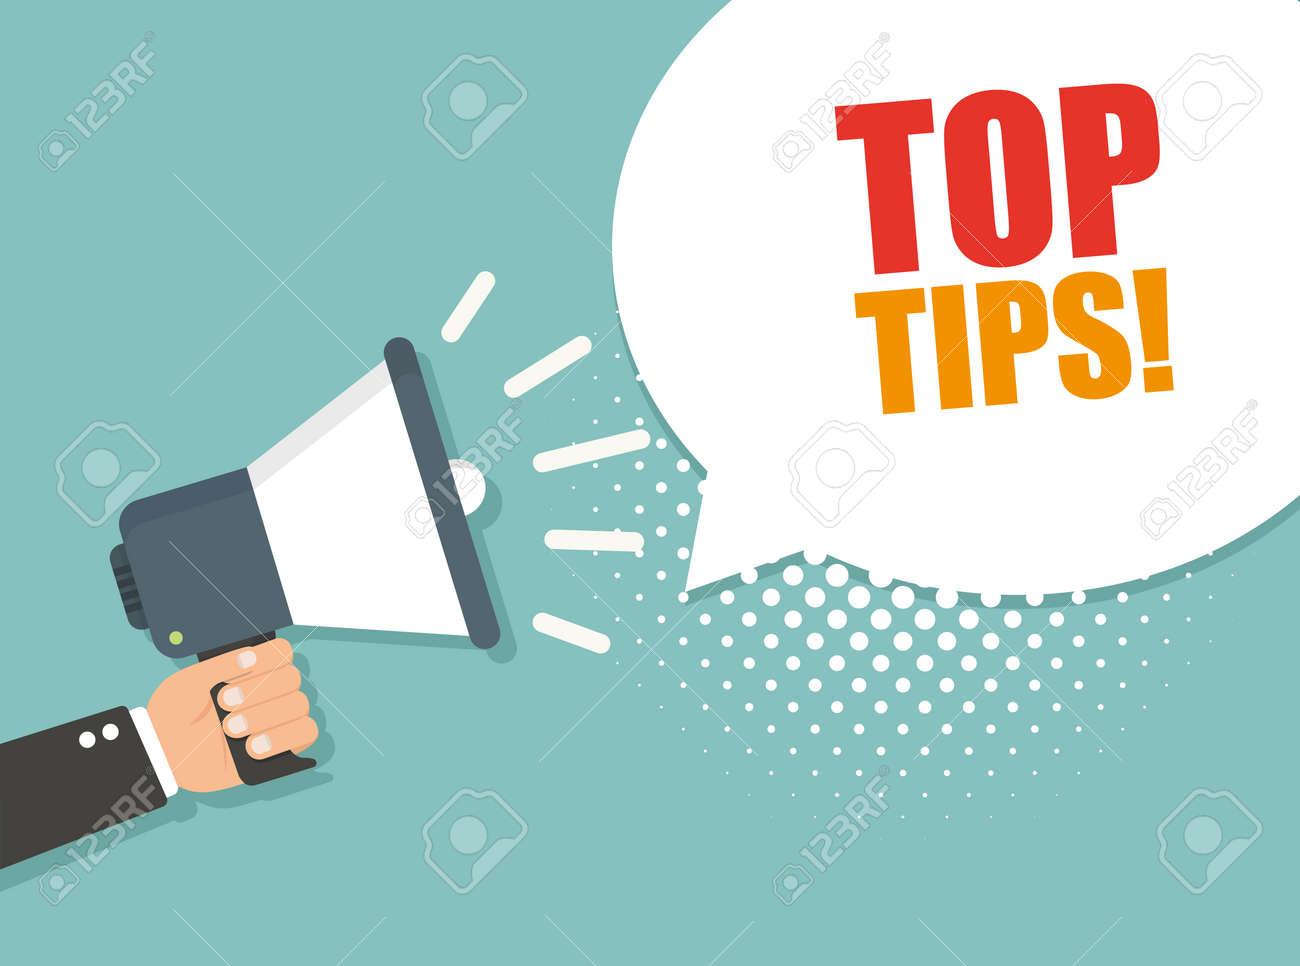 Top tips. Vector illustration - 101115193